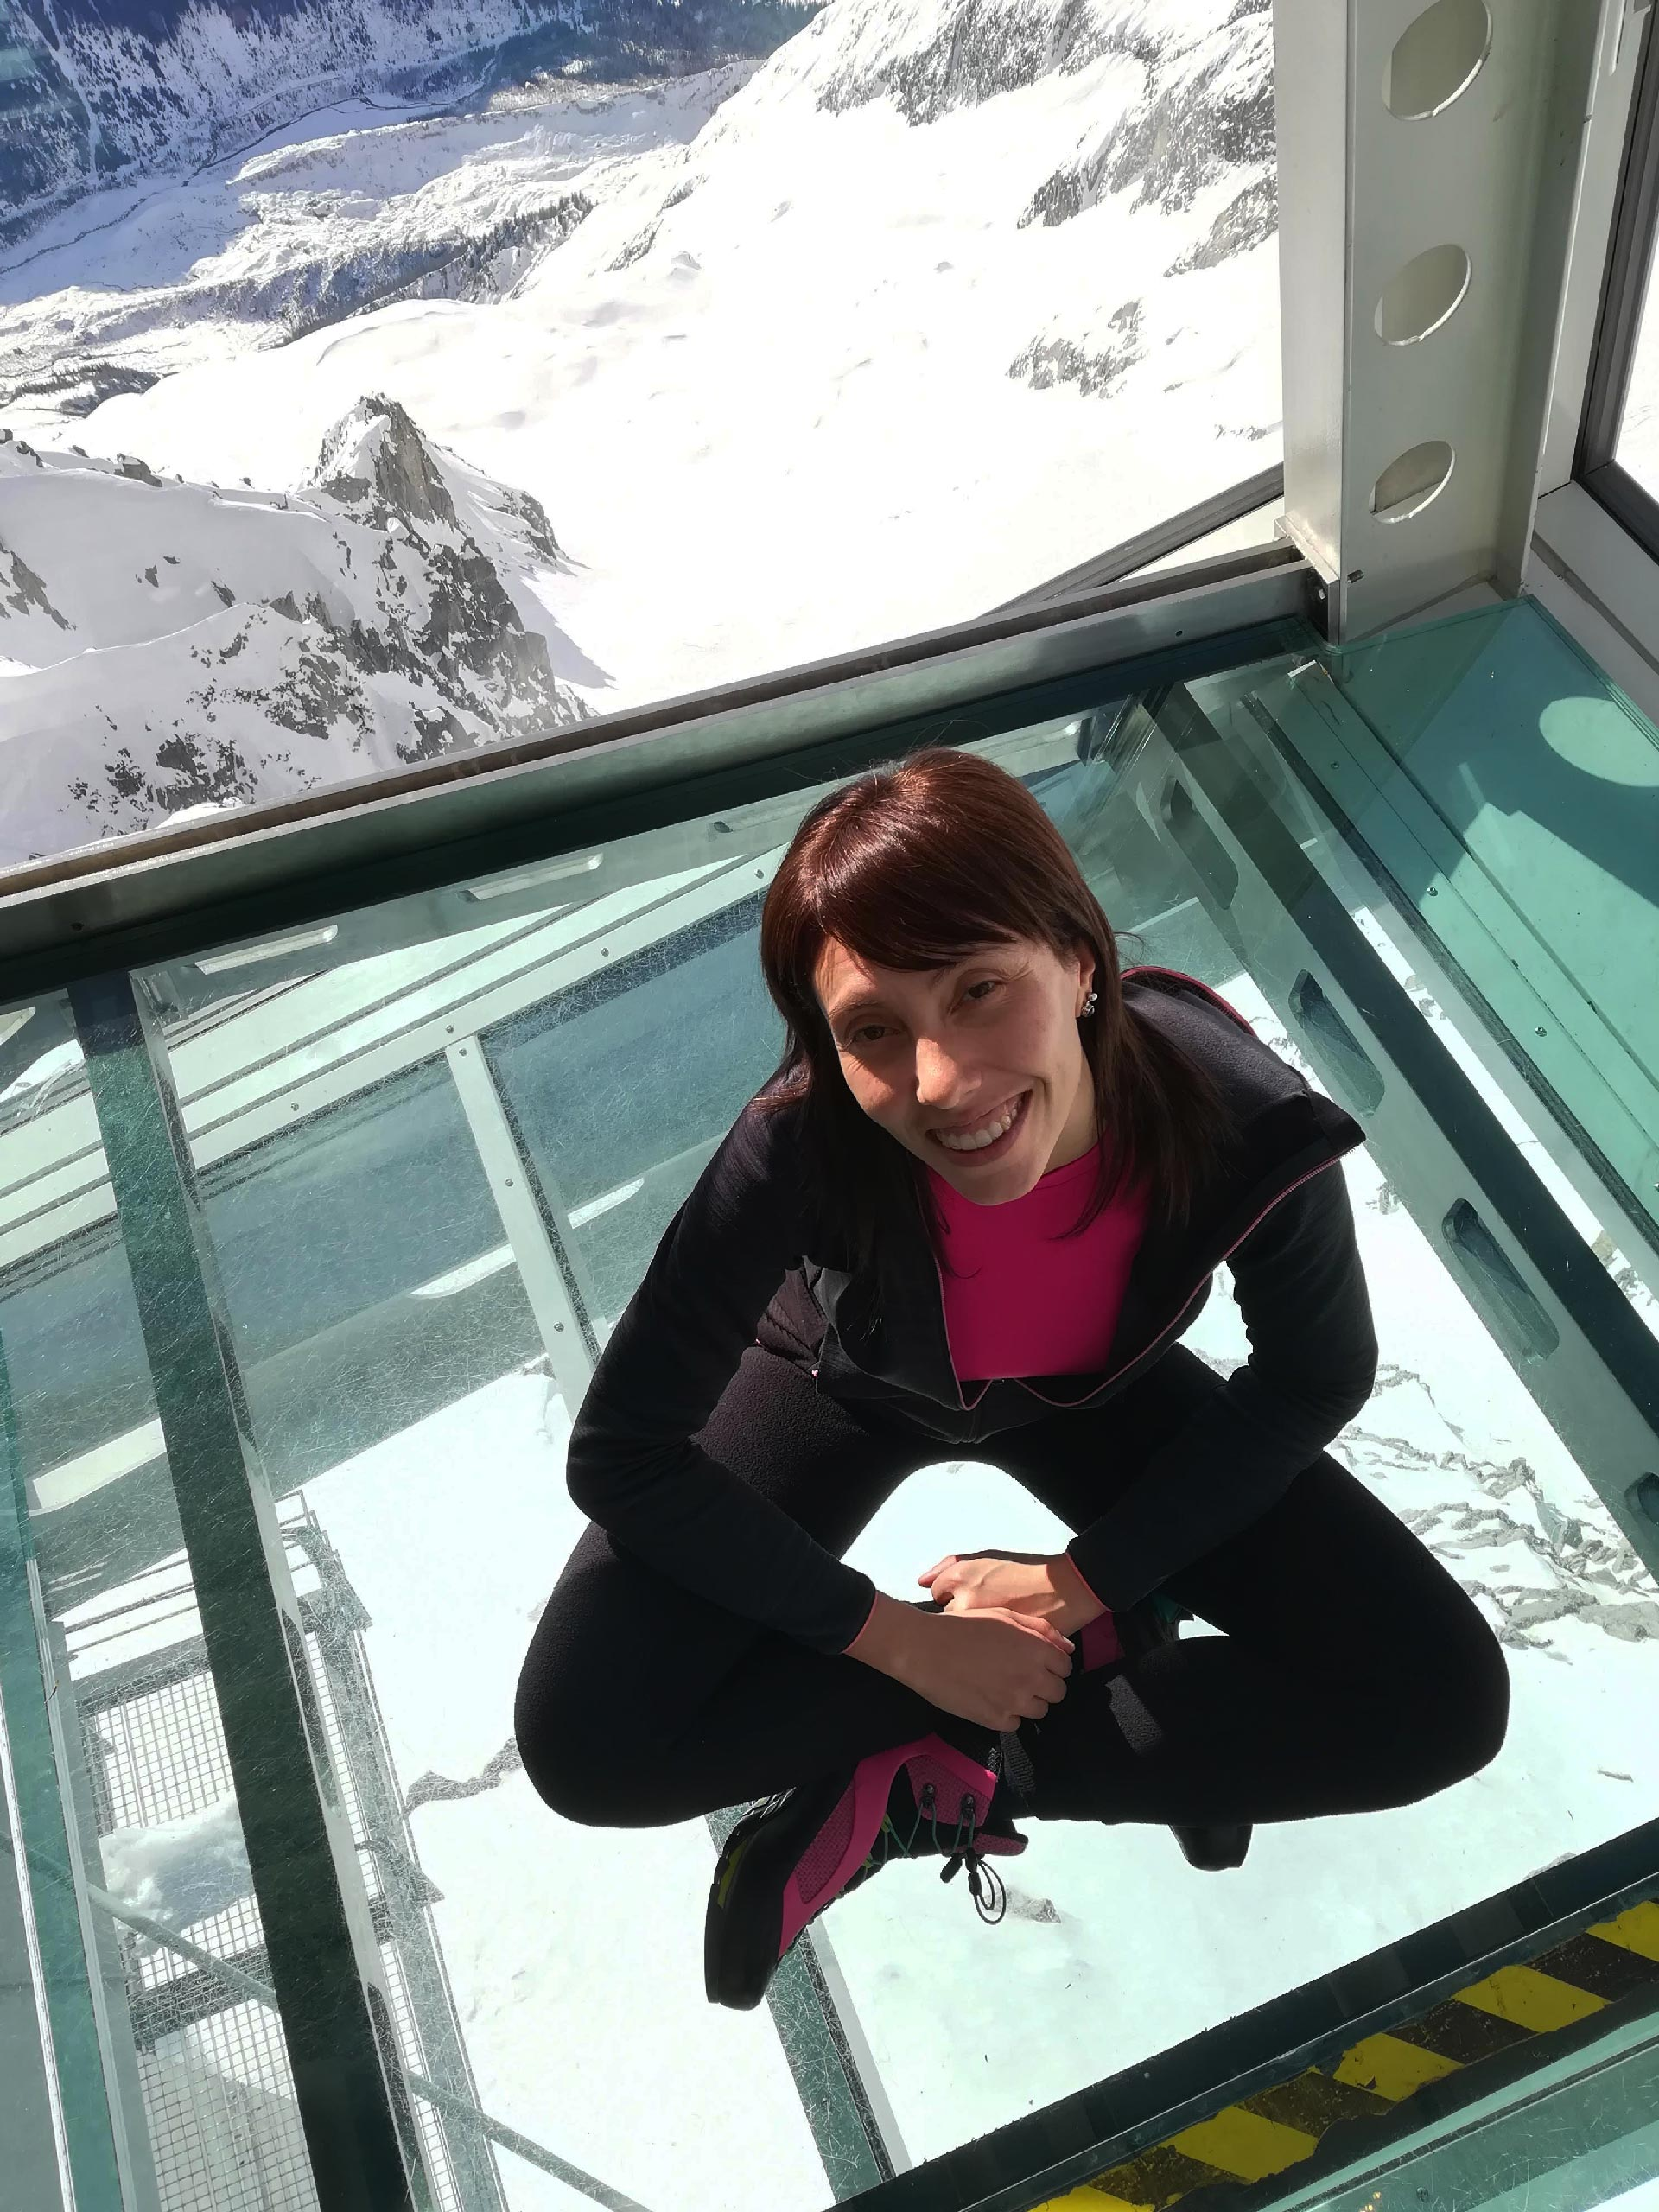 un partcolare della stazione di Punta Helbronner, Skyway Monte Bianco, Courmayeur, Valle d'Aosta